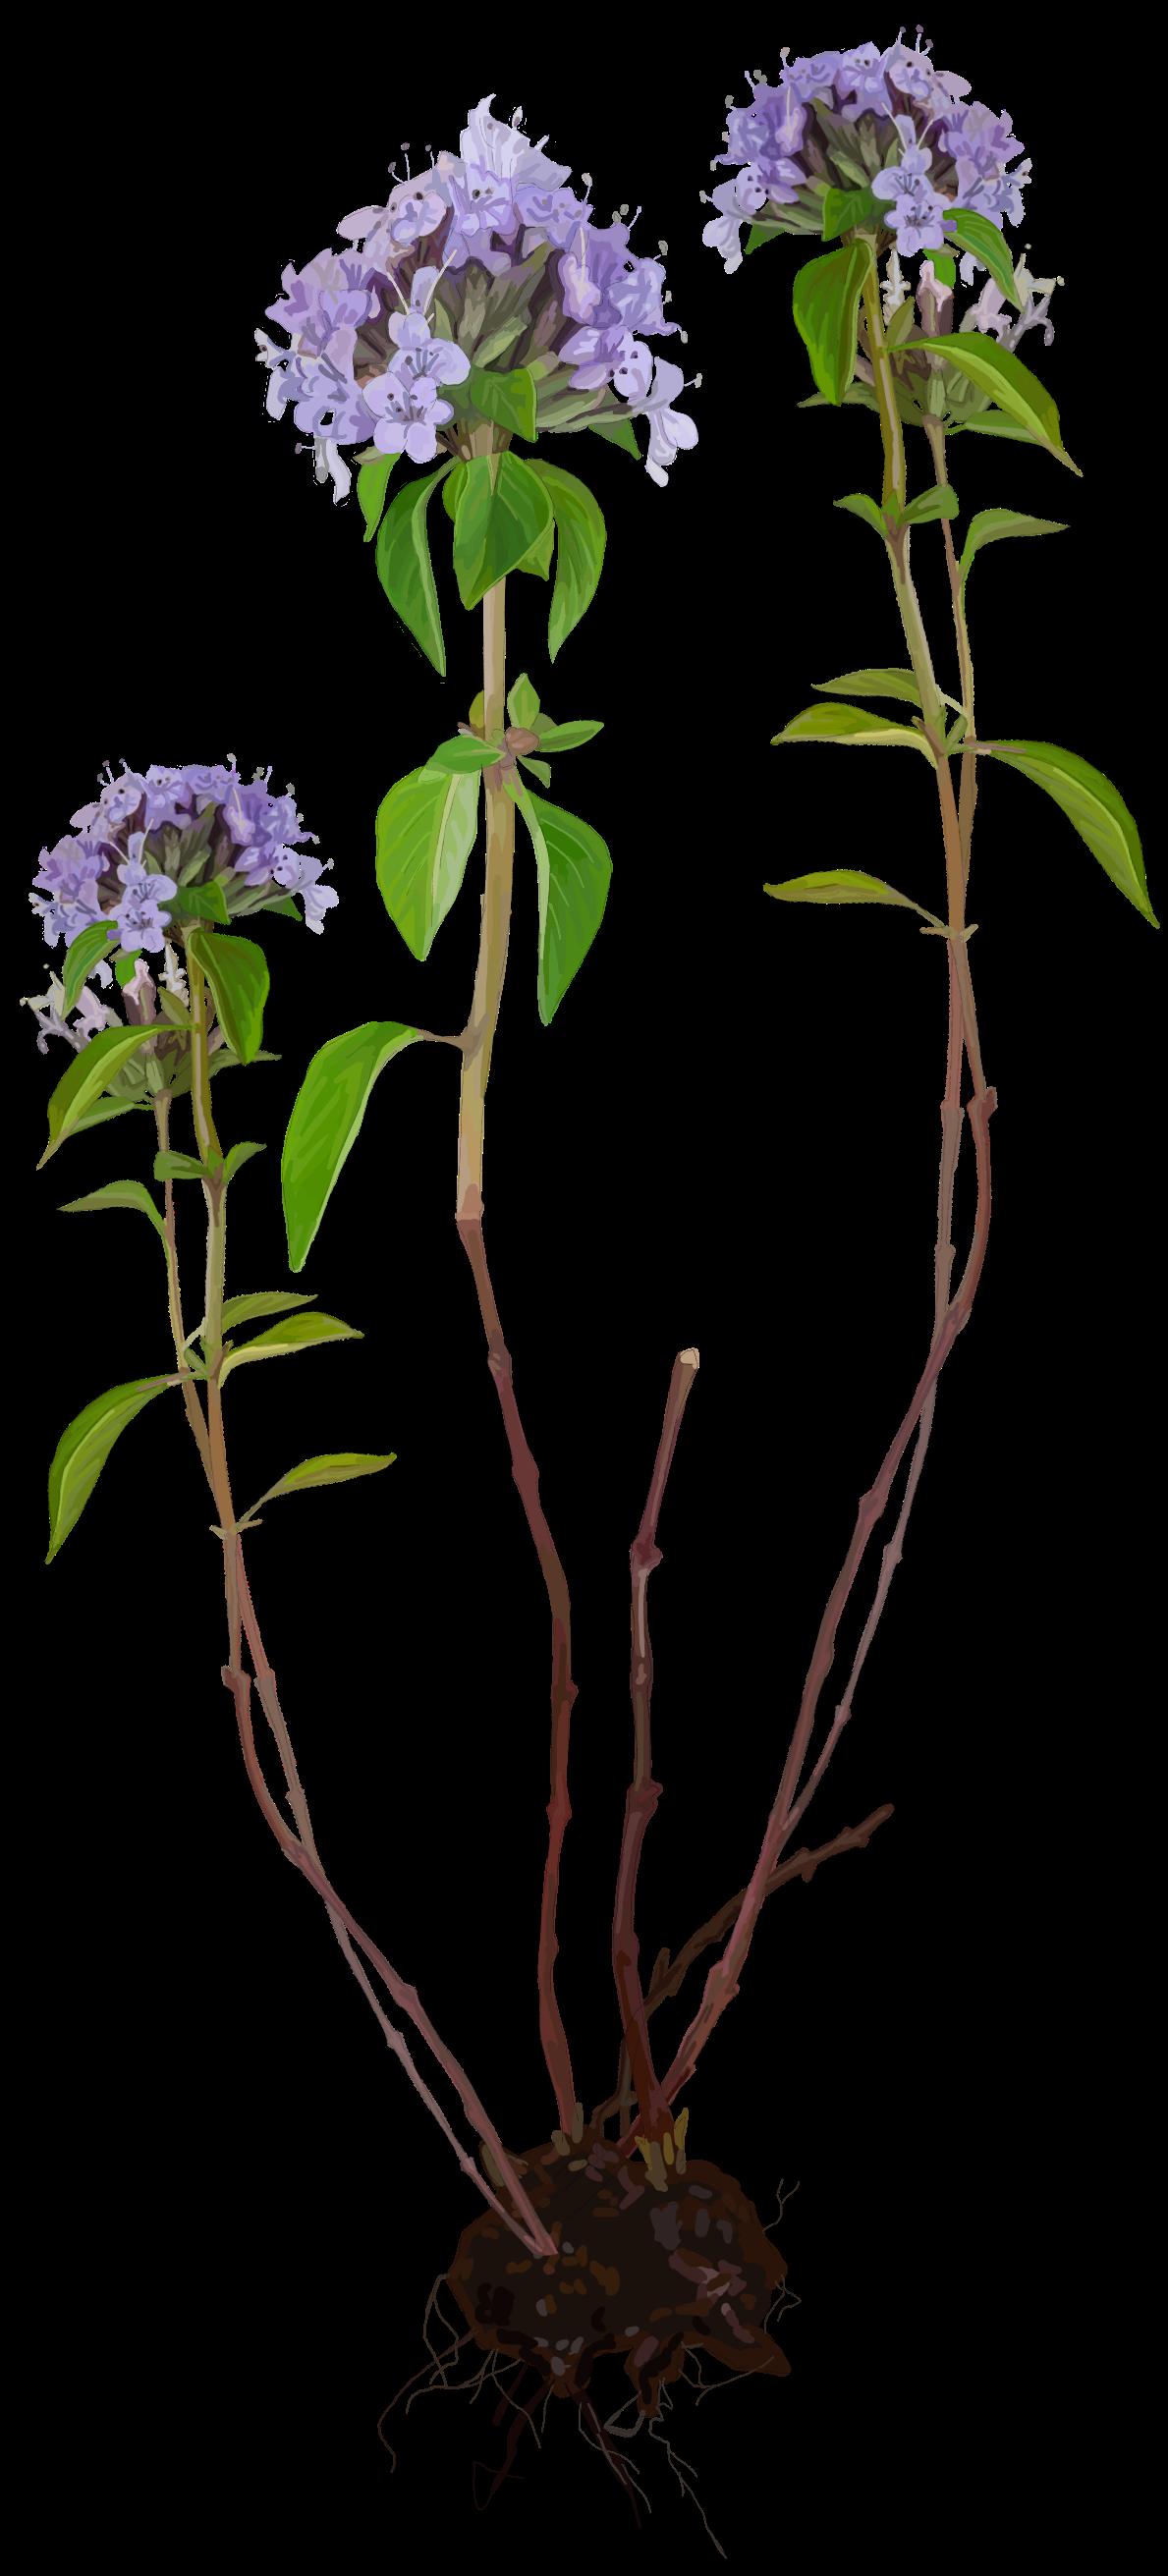 Thyme. Thymus vulgaris